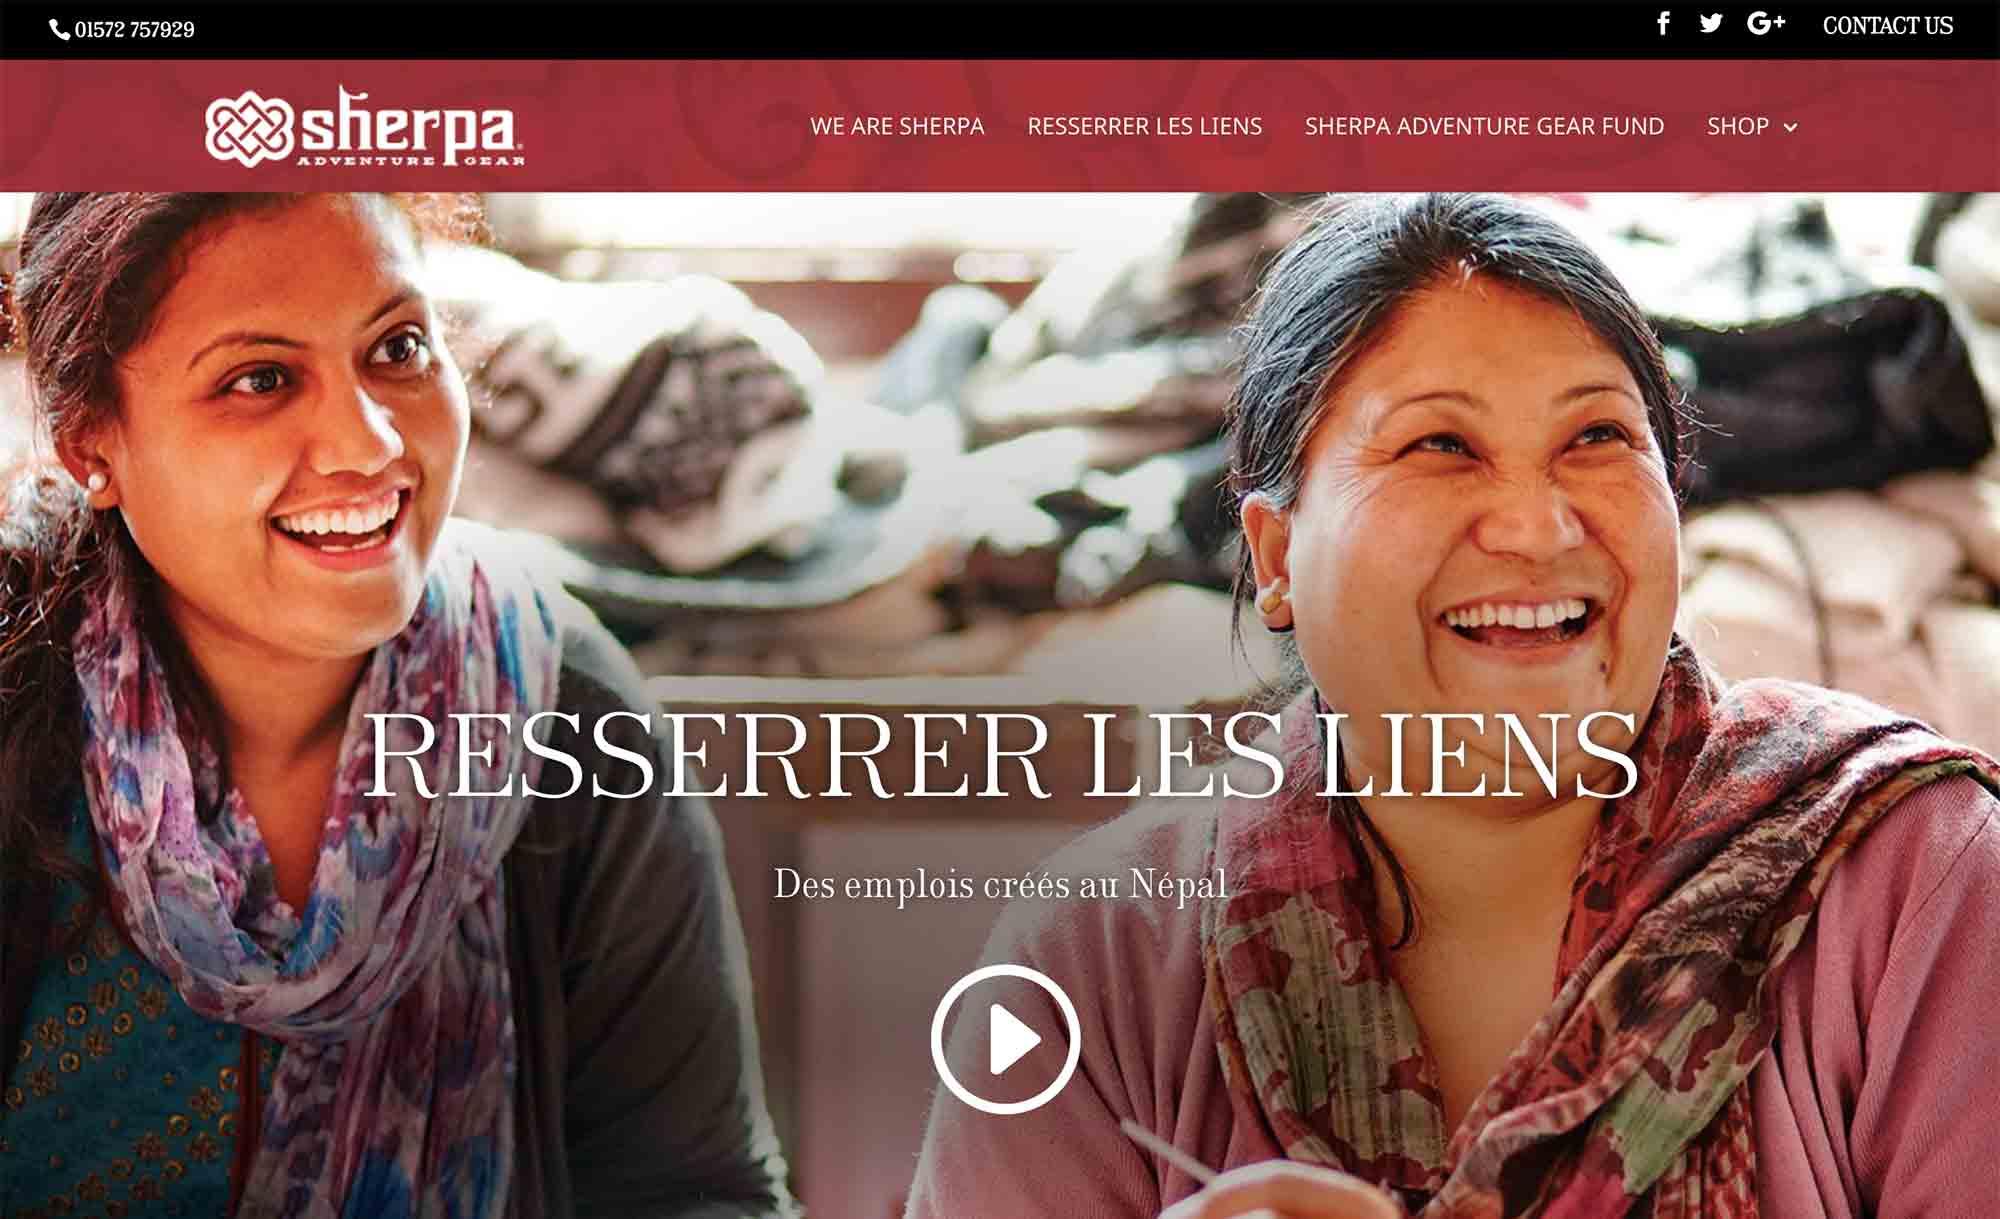 sherpaadventuregear.fr website design